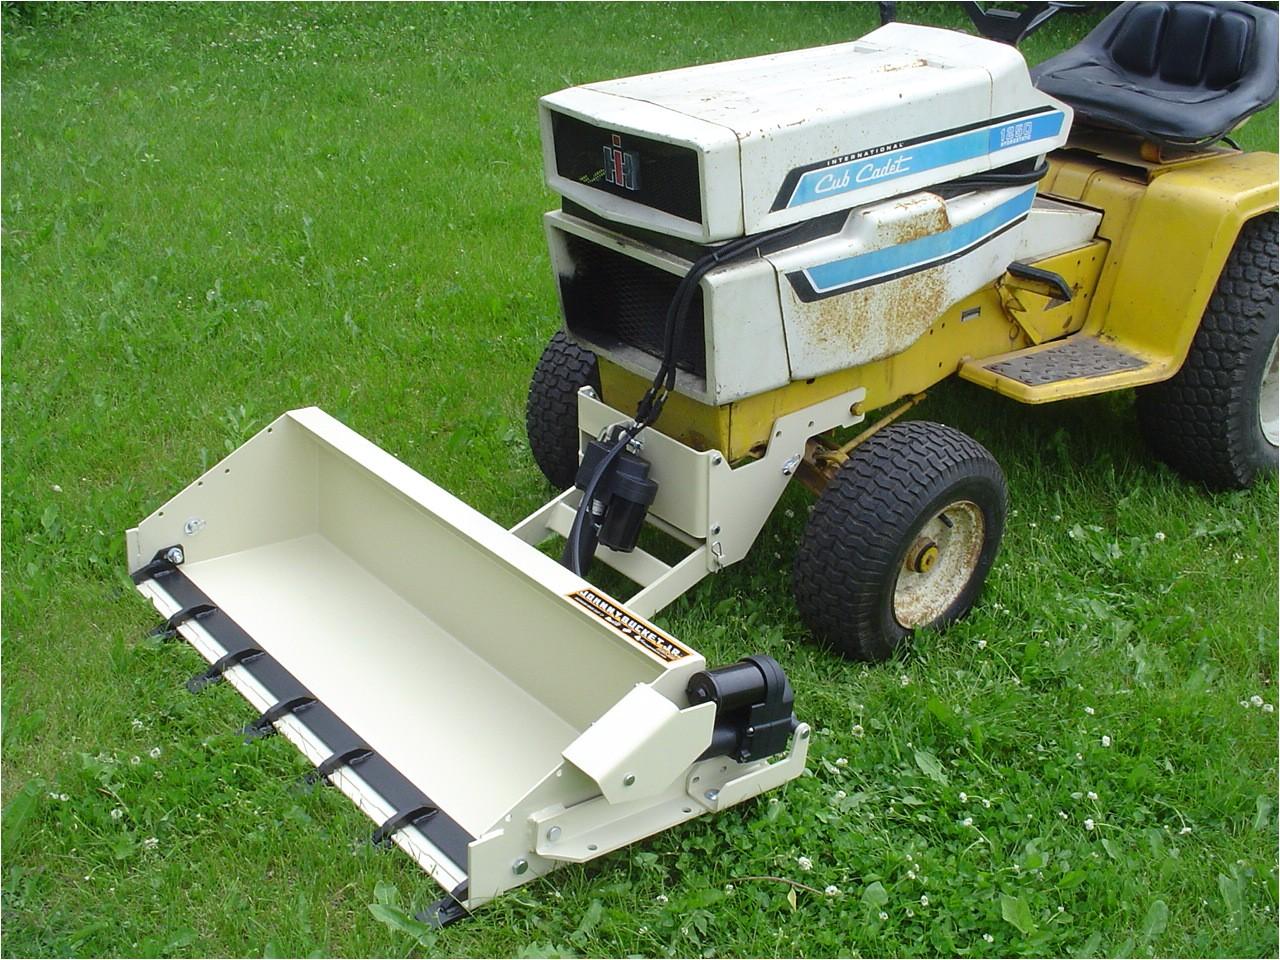 Cub Cadet Garden Tractor attachments Cub Cadet Johnny Bucket Jr Page